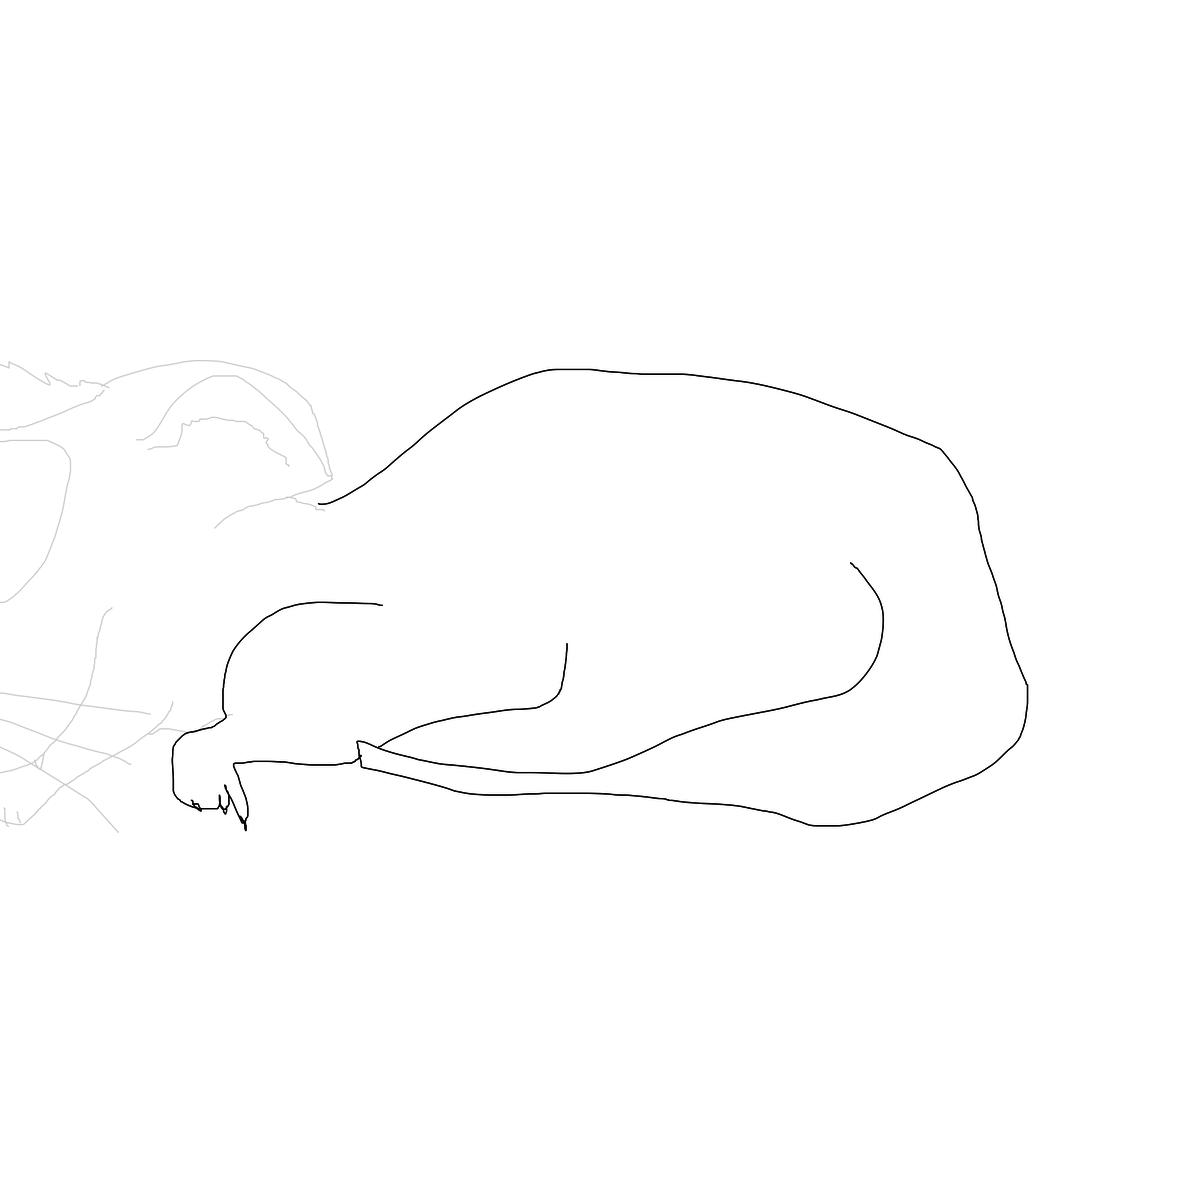 BAAAM drawing#3882 lat:-37.8193702697753900lng: 145.0153961181640600